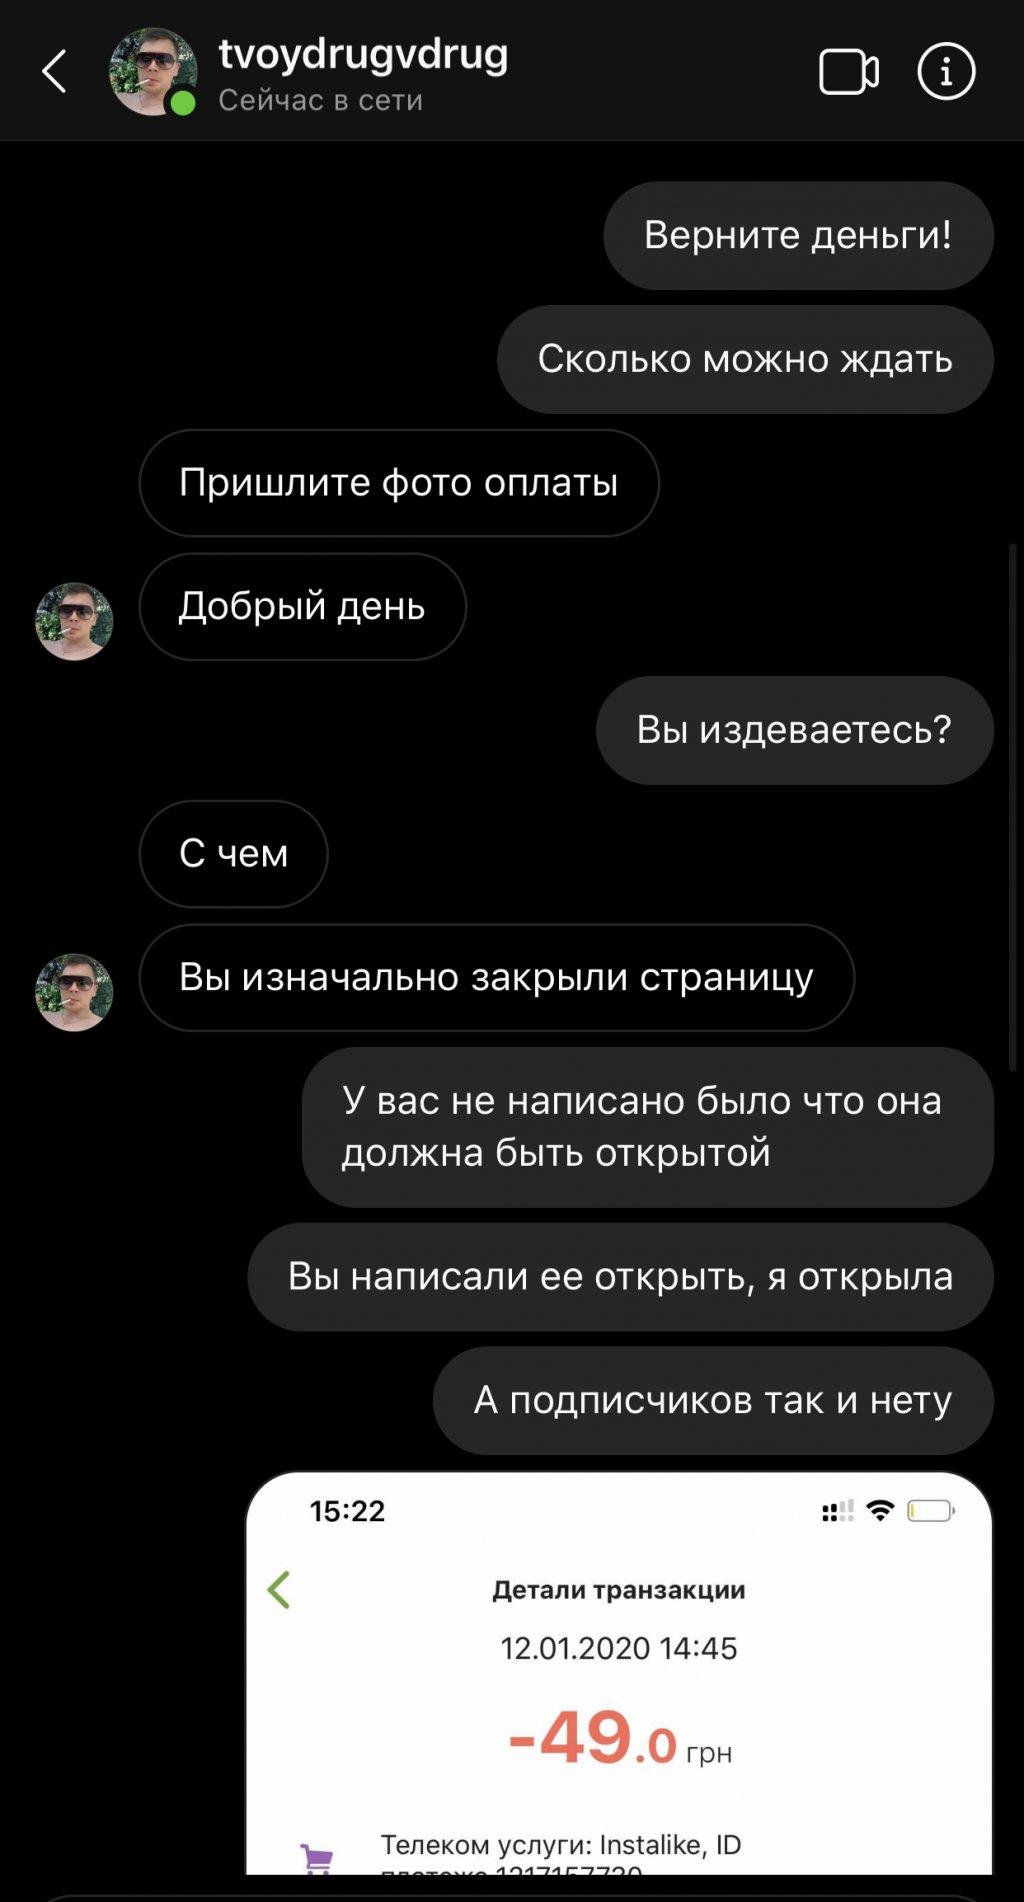 Instalike.store - ОСТОРОЖНО ОБМАНЩИКИ